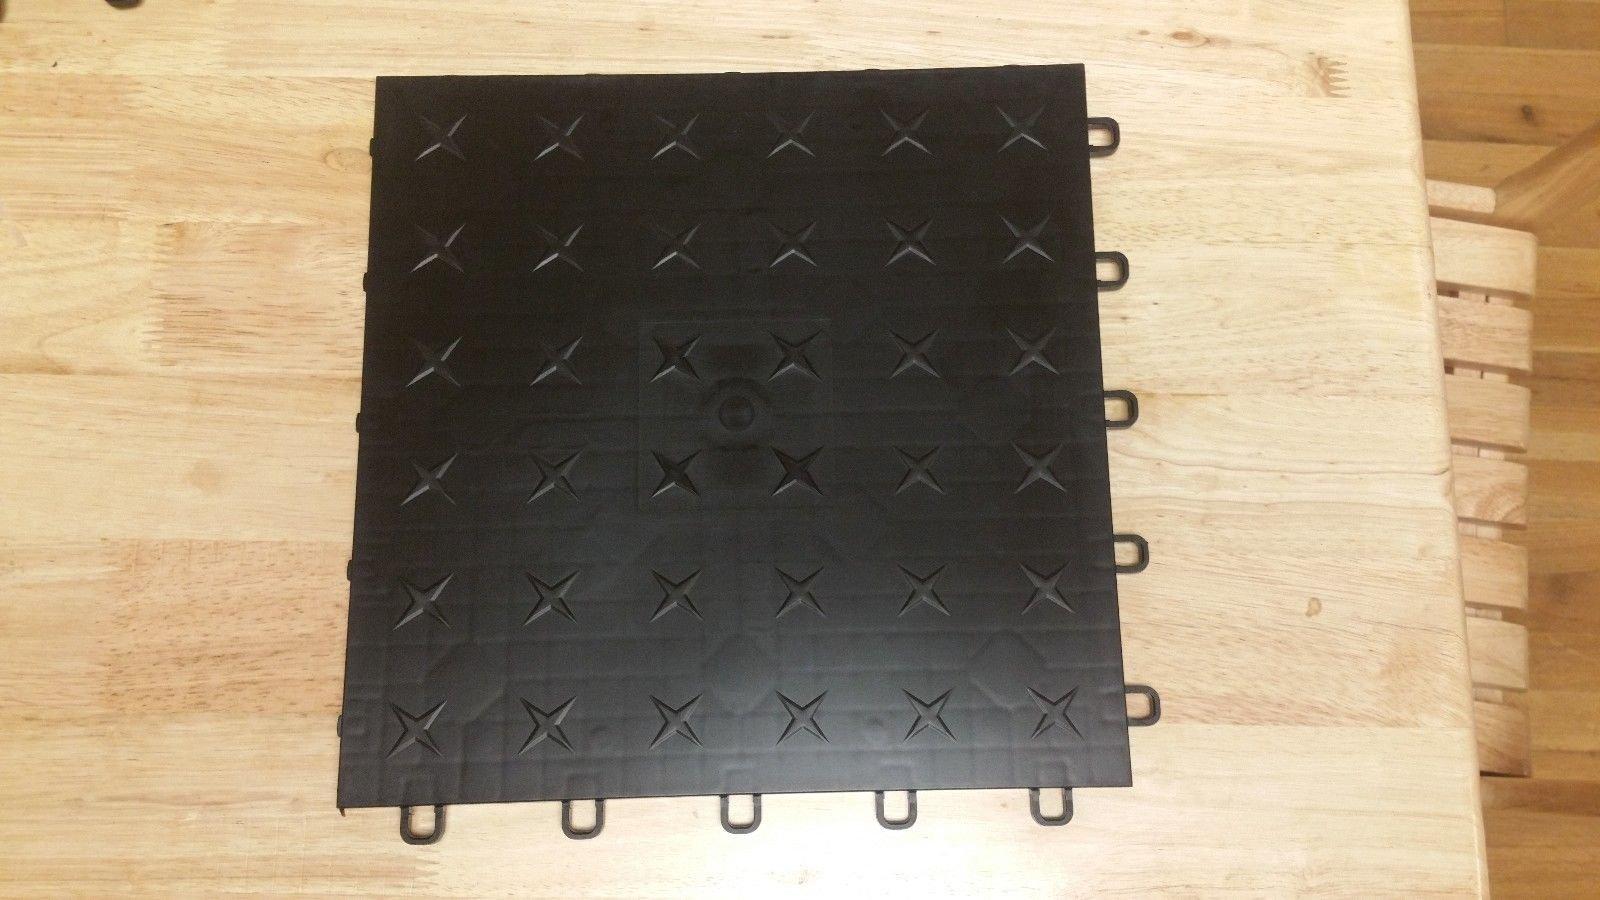 JSP Plastic Black Garage Tile Garage Floor Tiles Interlocking Basement Mat Black Diamond plate Made in USA (100) by JSP Manufacturing (Image #2)